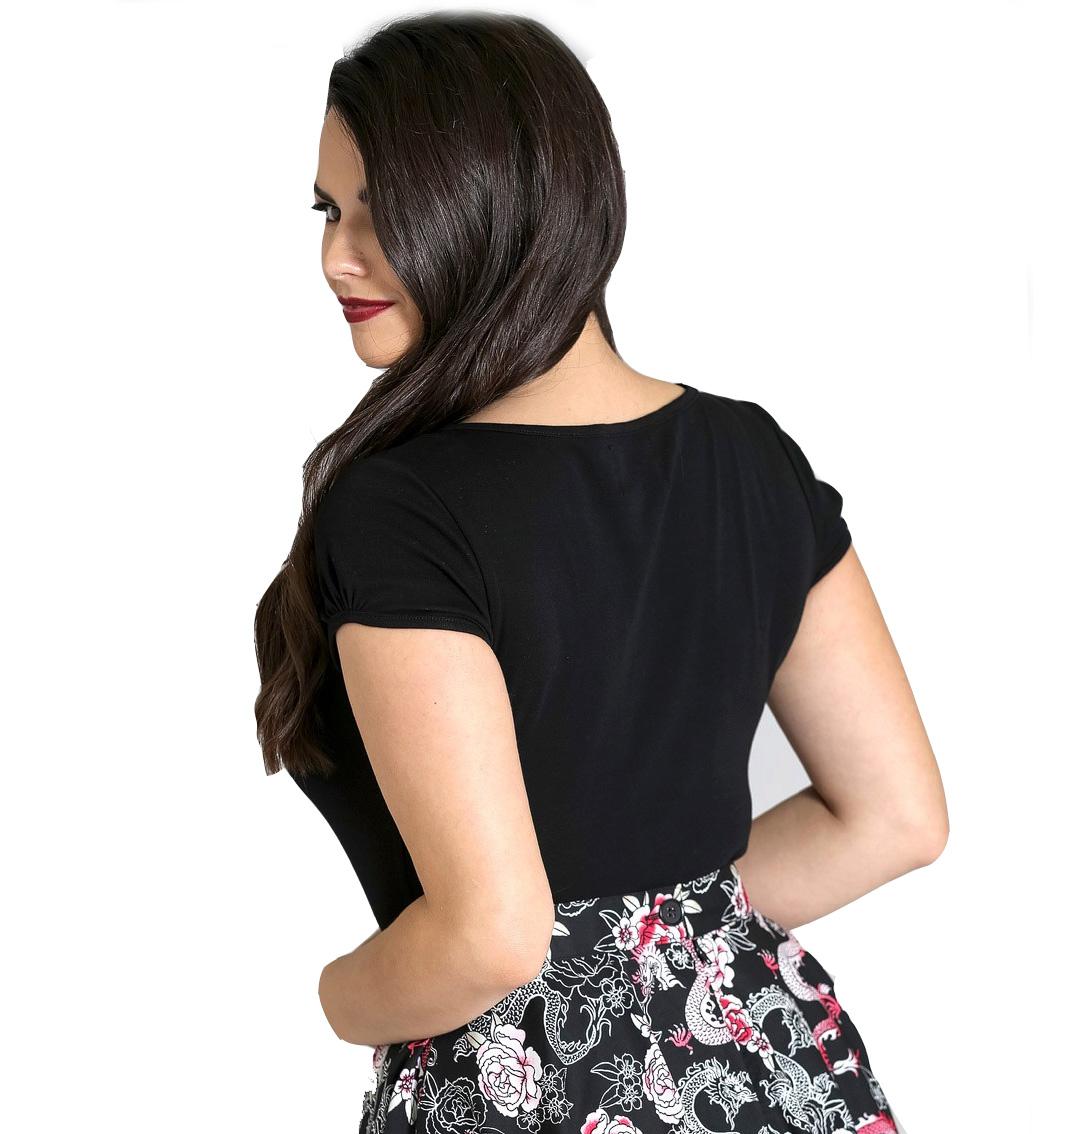 Hell-Bunny-Shirt-50s-Rockabilly-Top-MIA-Plain-Black-Short-Sleeves-All-Sizes thumbnail 35